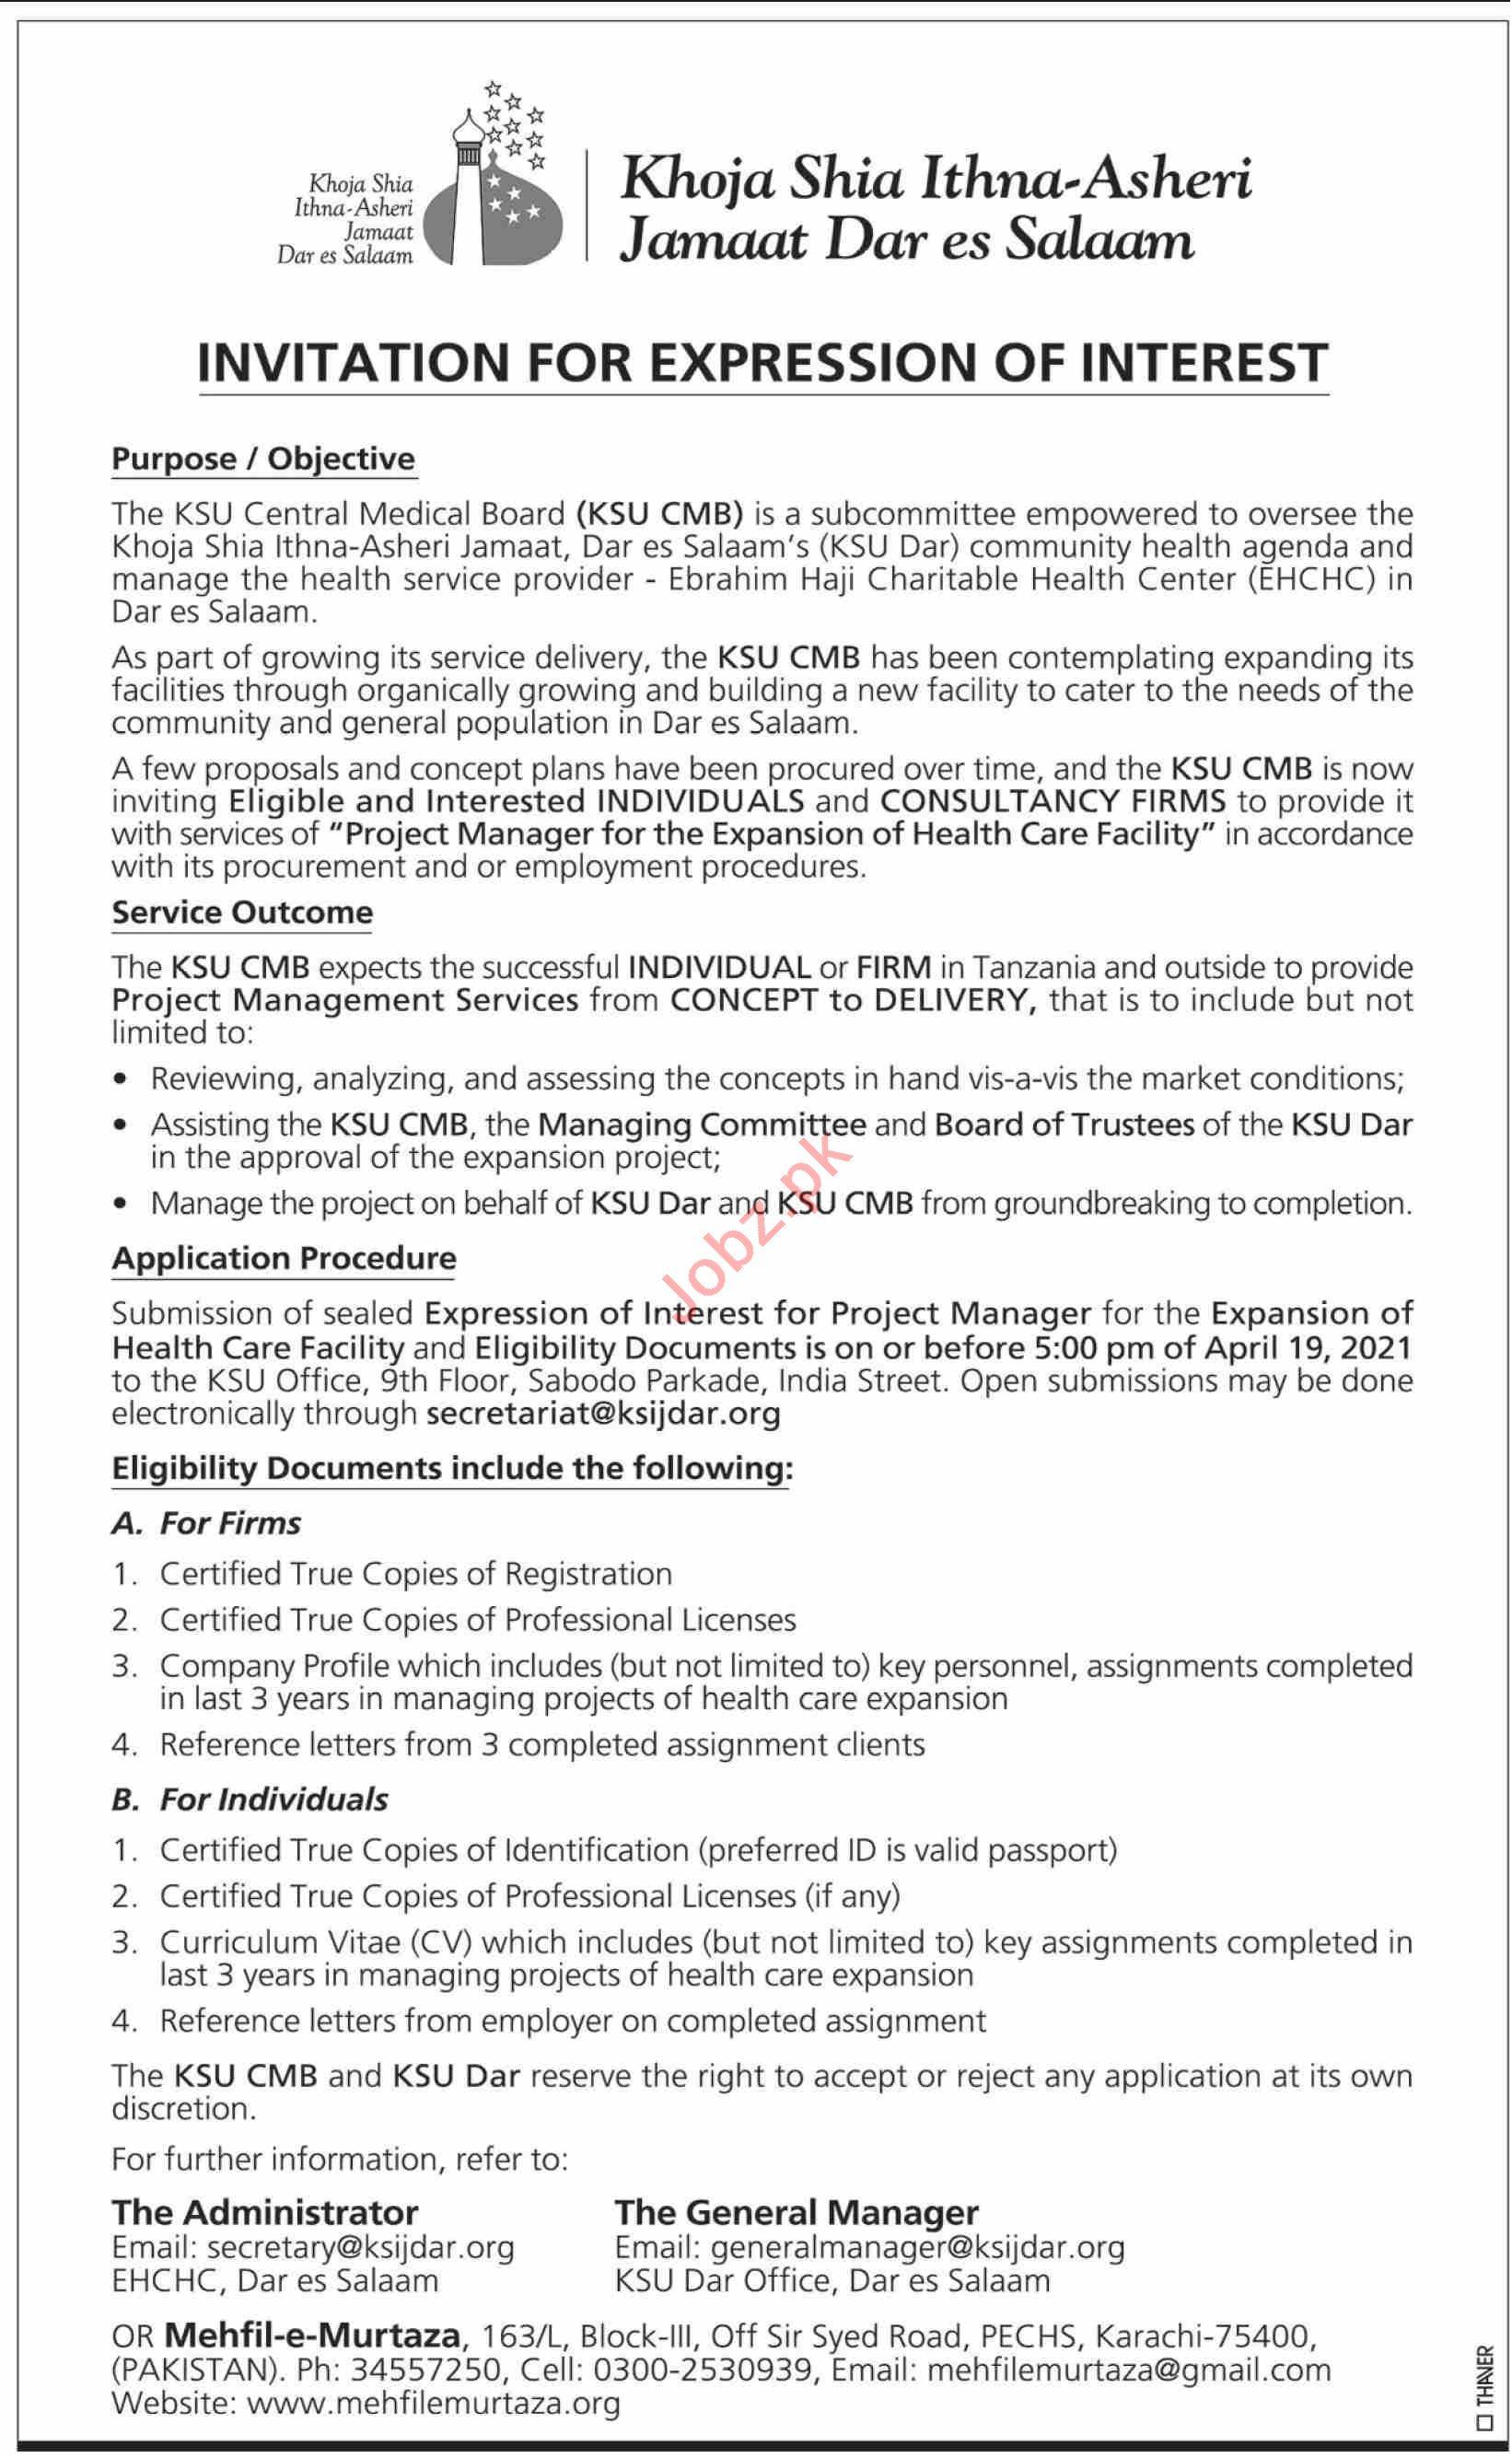 Khoja Shia Ithna Asheri Jamaat Dar es Salaam Jobs 2021